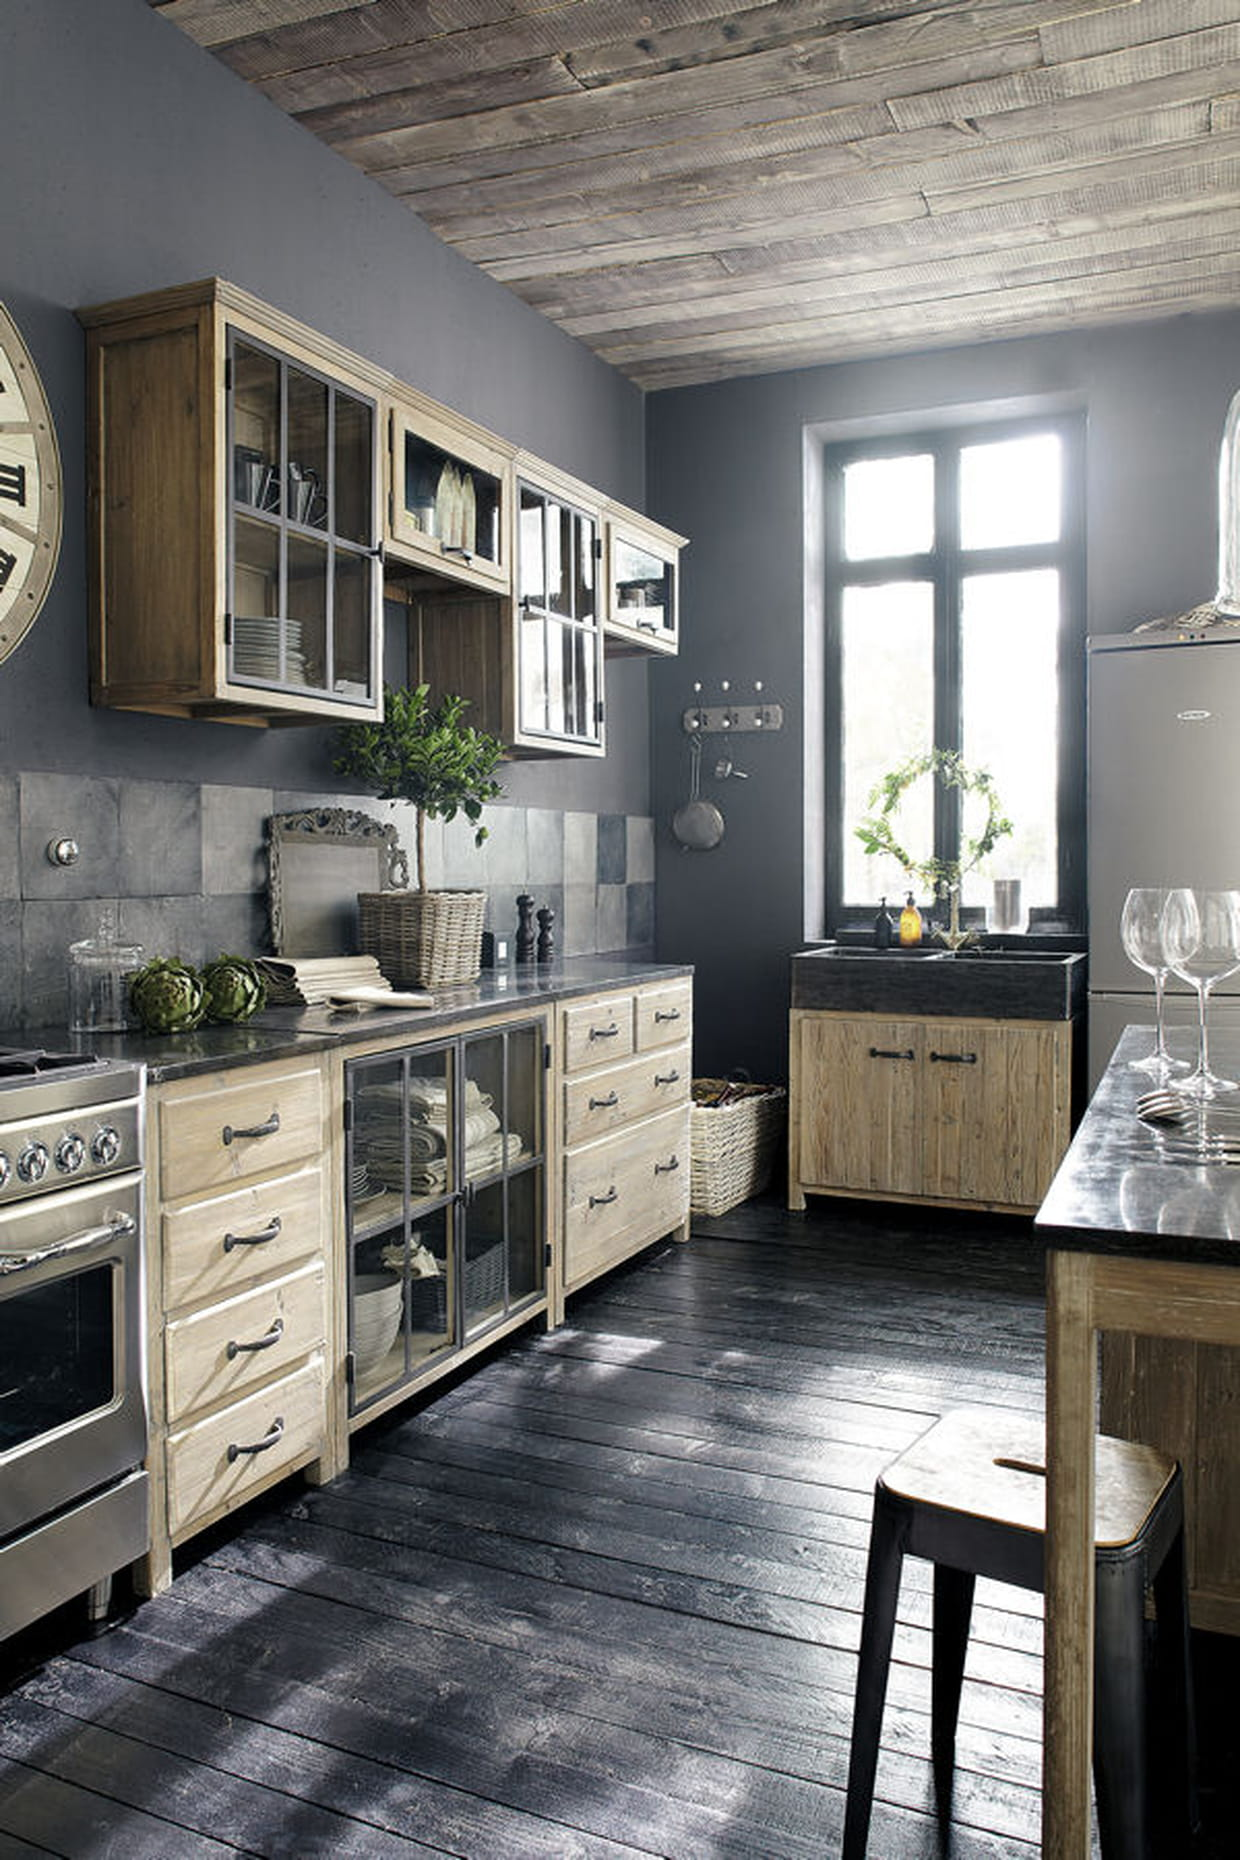 une cuisine esprit brocante. Black Bedroom Furniture Sets. Home Design Ideas